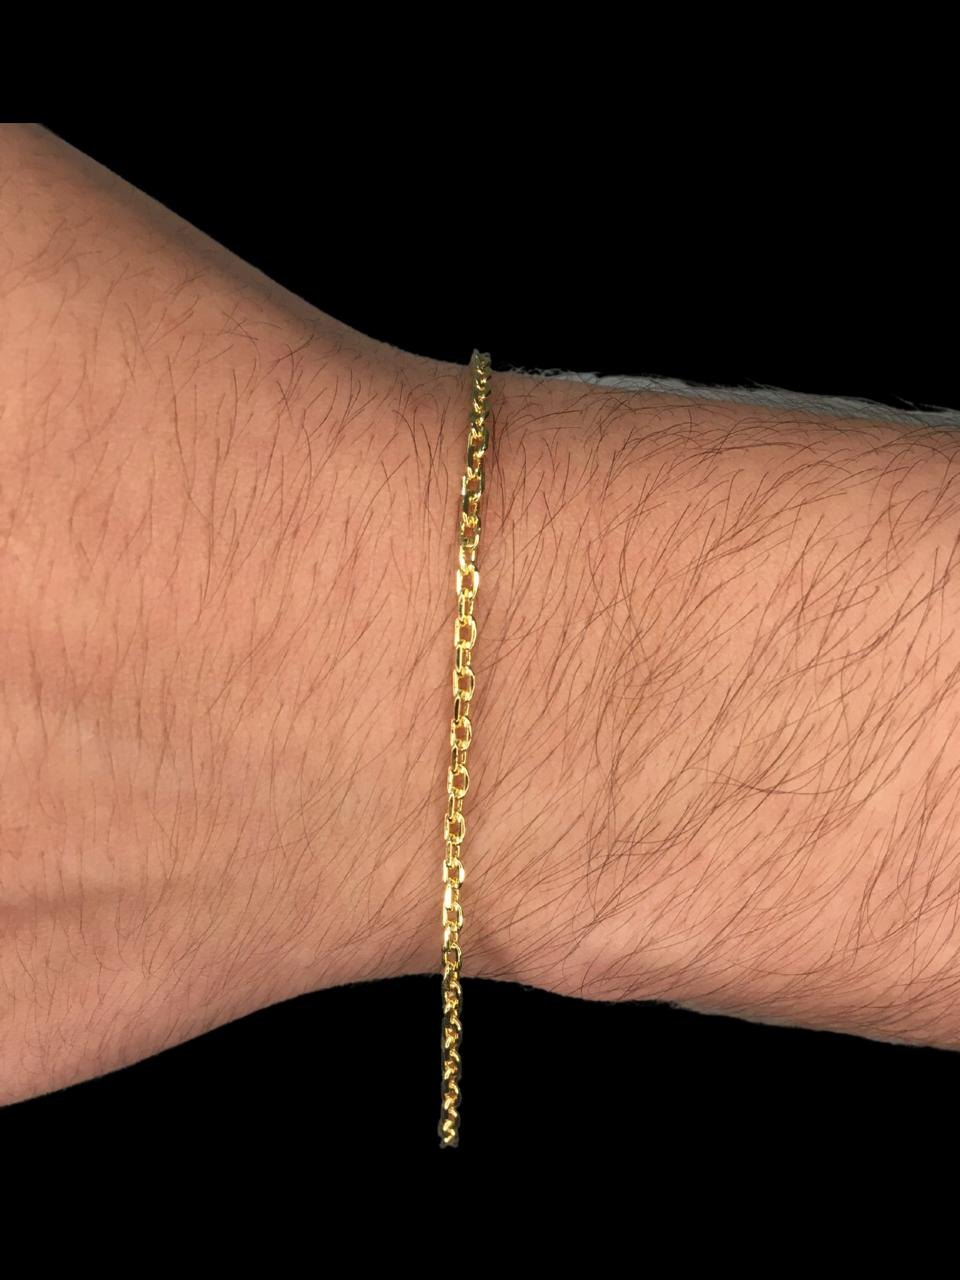 Pulseira Cartie -  2 milímetros - Achatada  - 22 Centímetros - fecho gaveta - Banhado a ouro 18 k